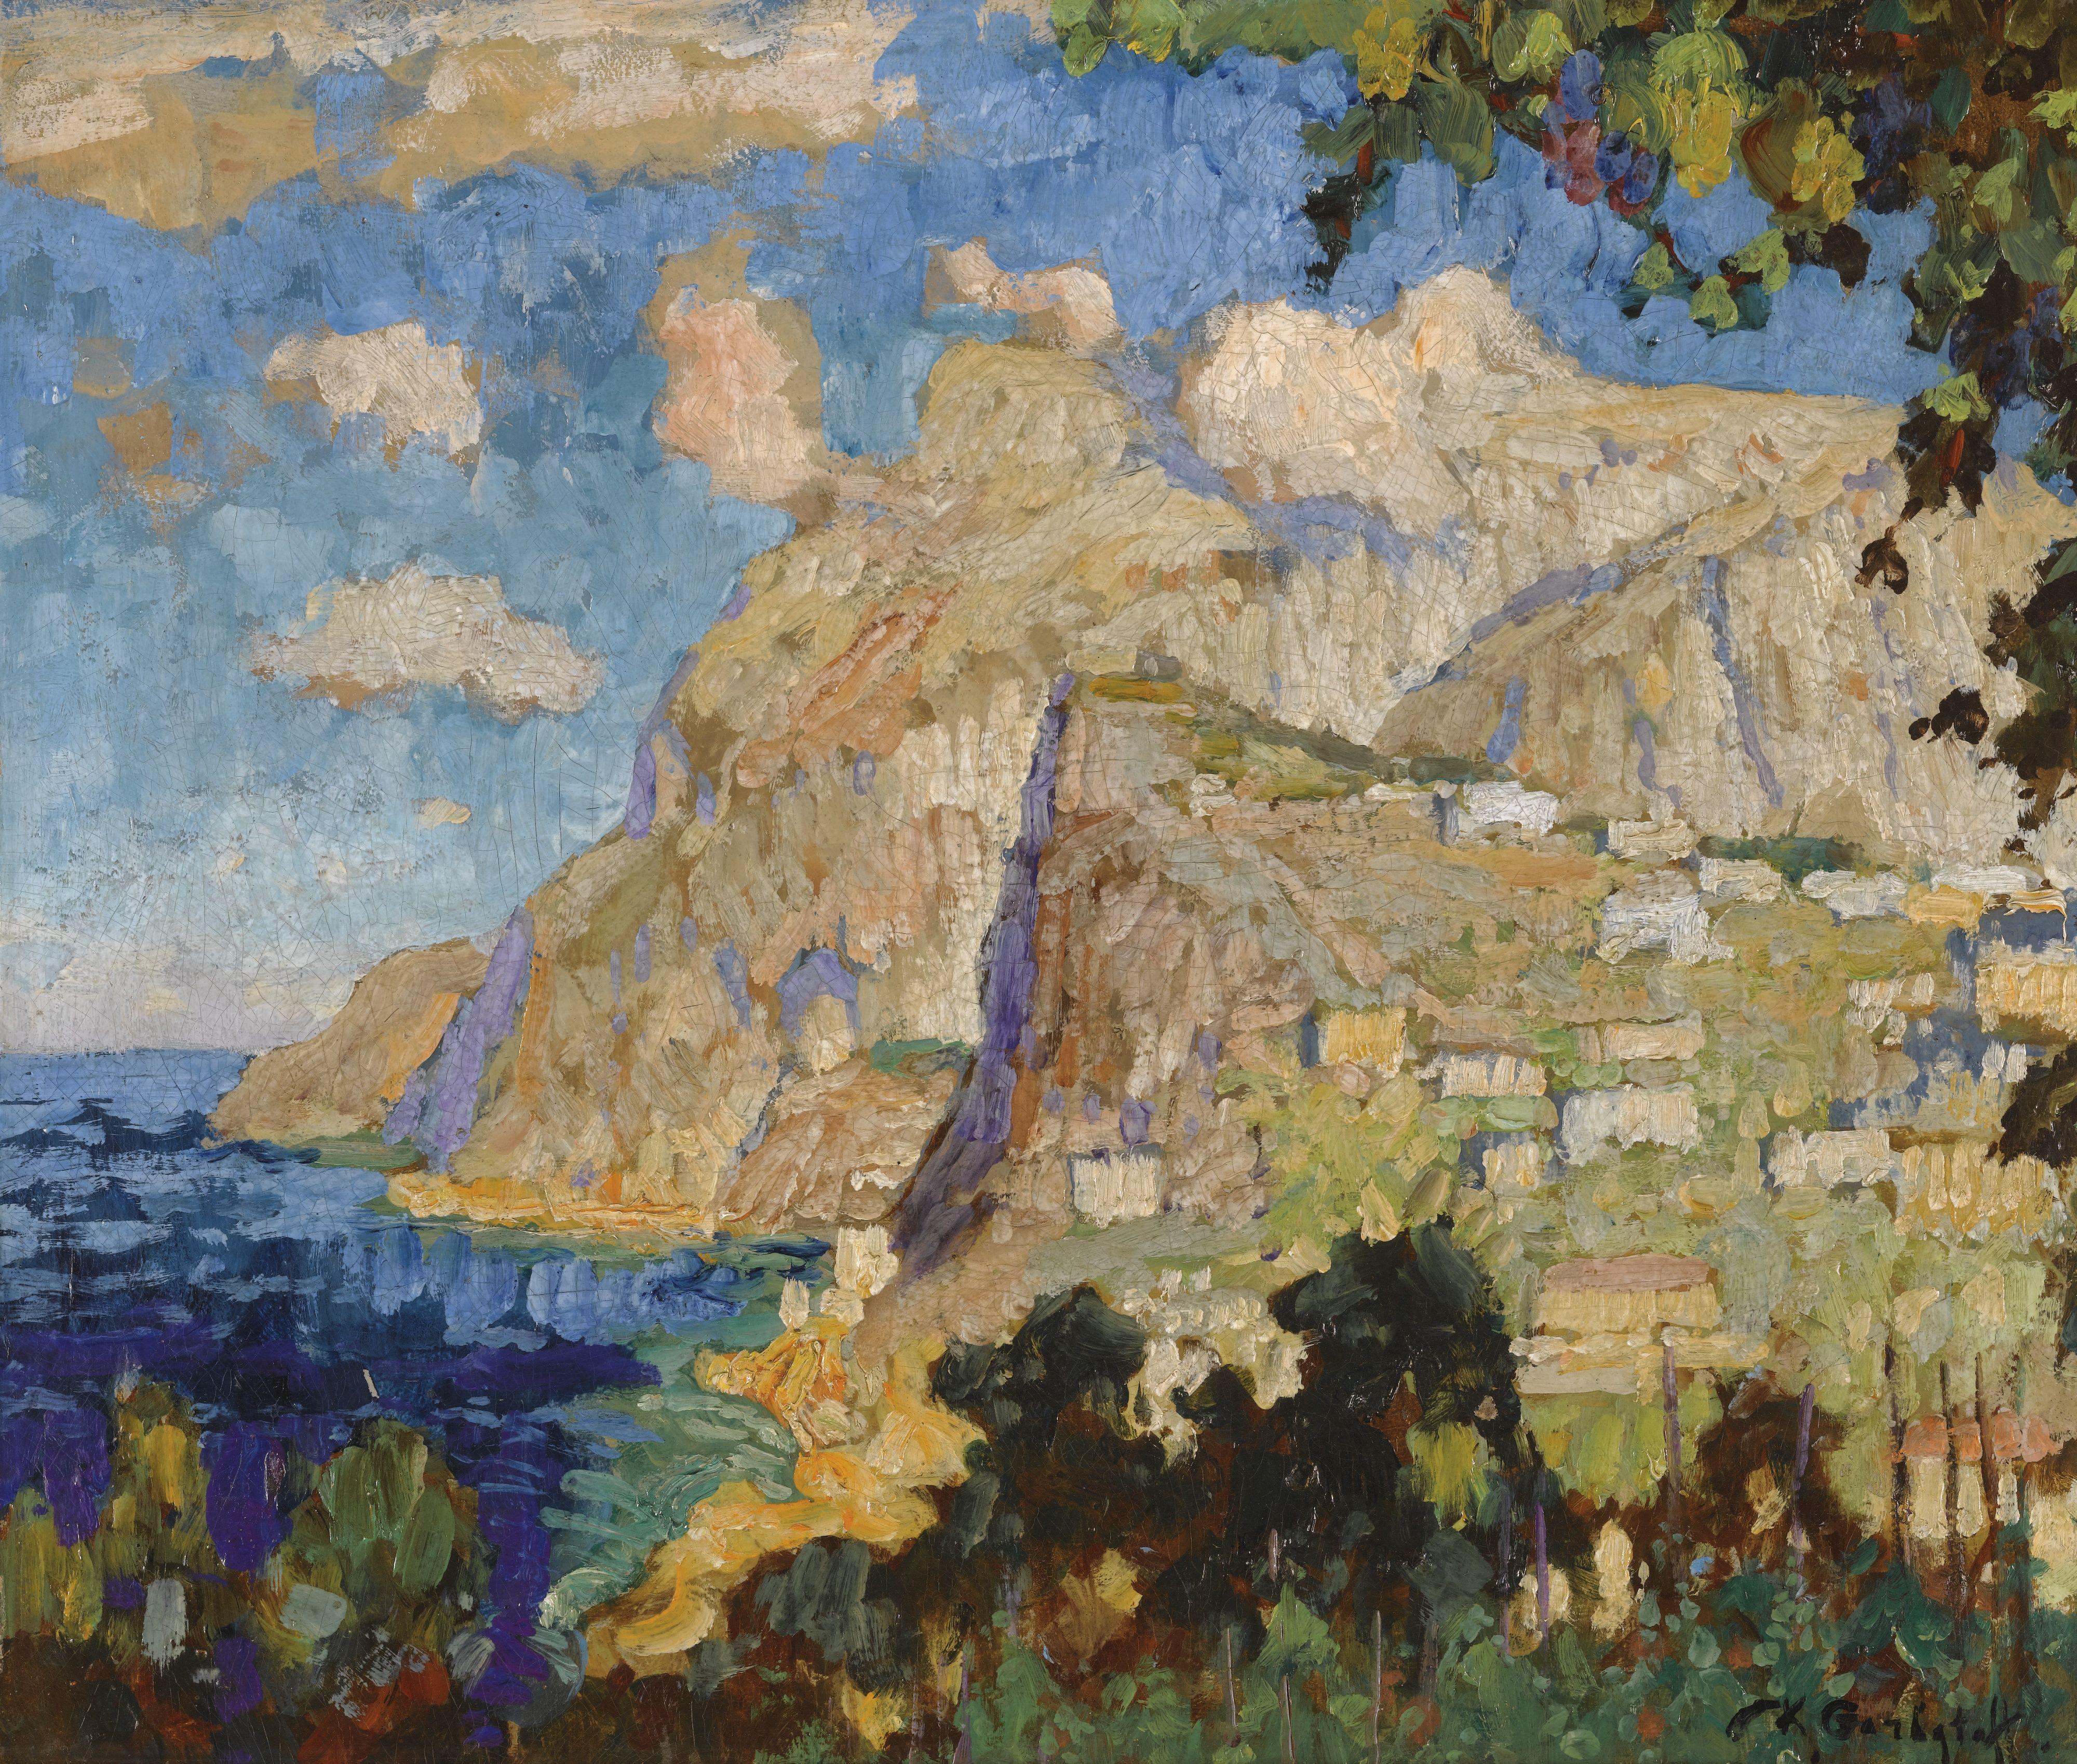 Gorbatov, Konstantin Ivanovich     Landscape     Sotheby's